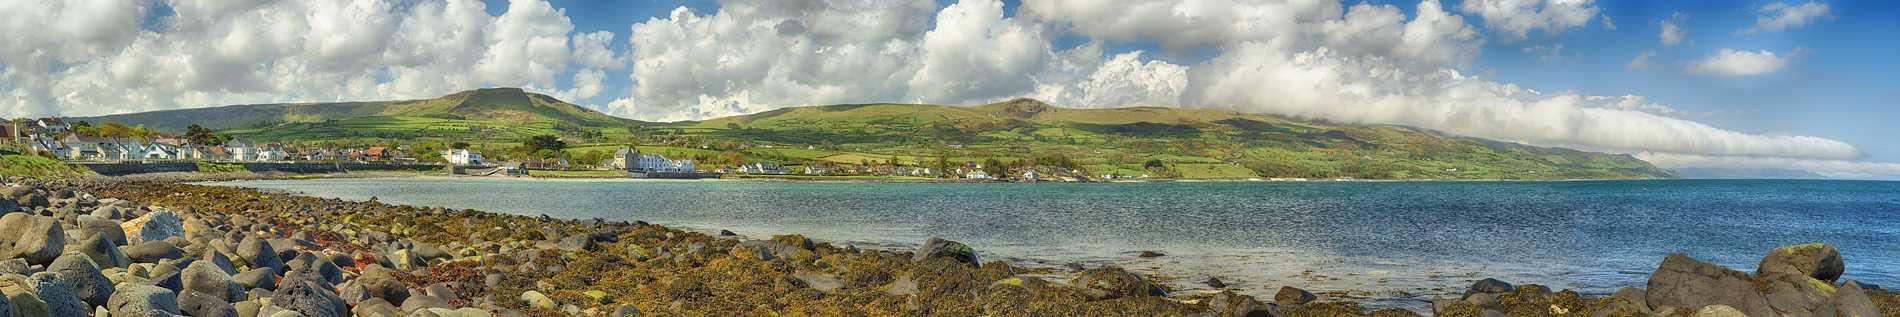 Ballygalley - Northern Ireland